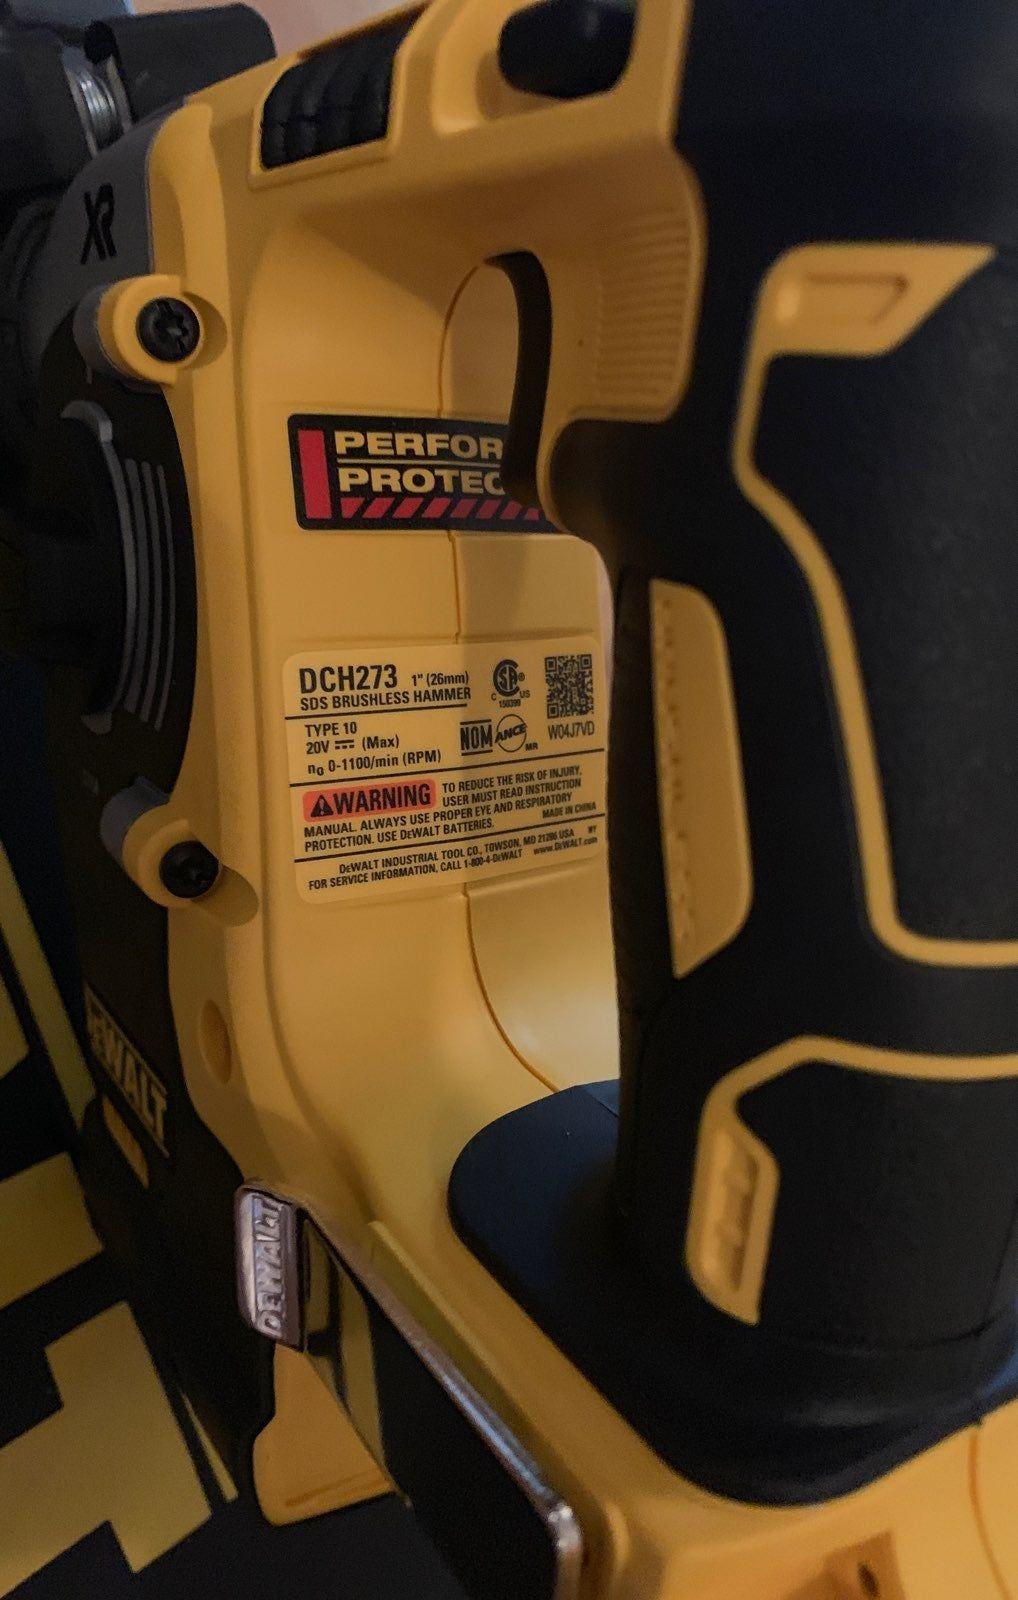 Dewalt sds 20v roto hammer dch273 with 2 batteries and